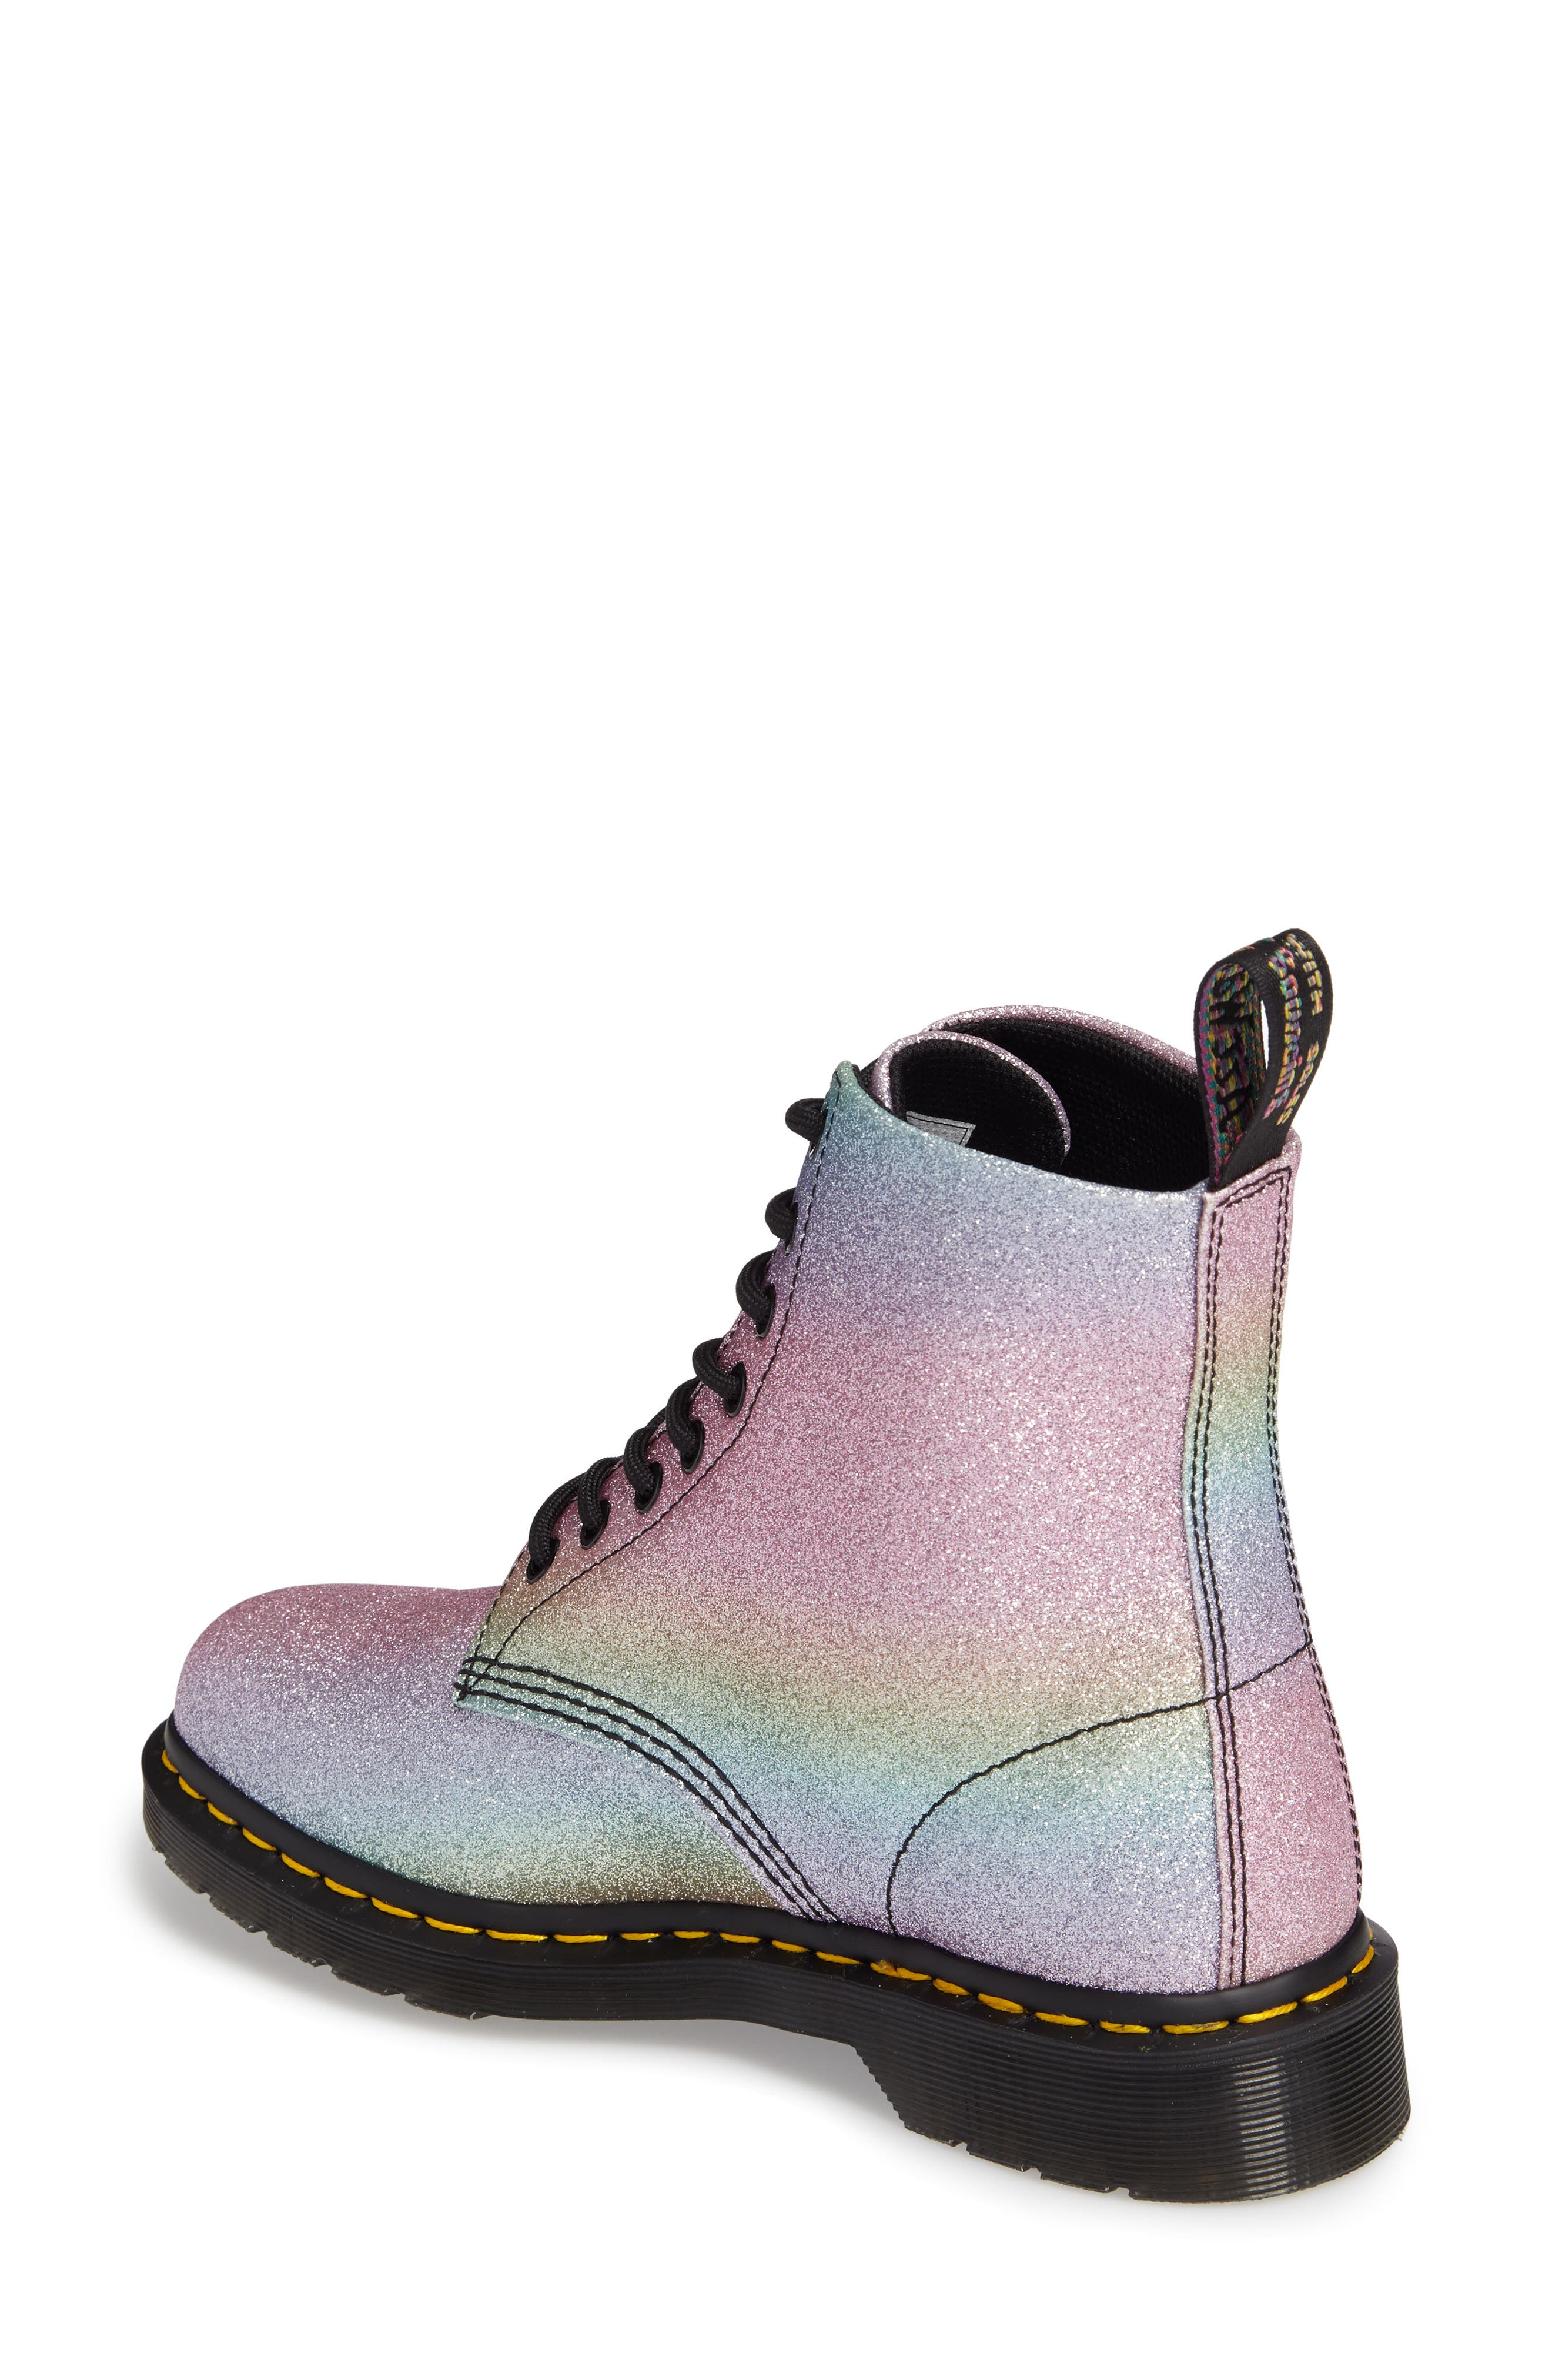 Pascal Glitter Boot,                             Alternate thumbnail 2, color,                             MULTI GLITTER